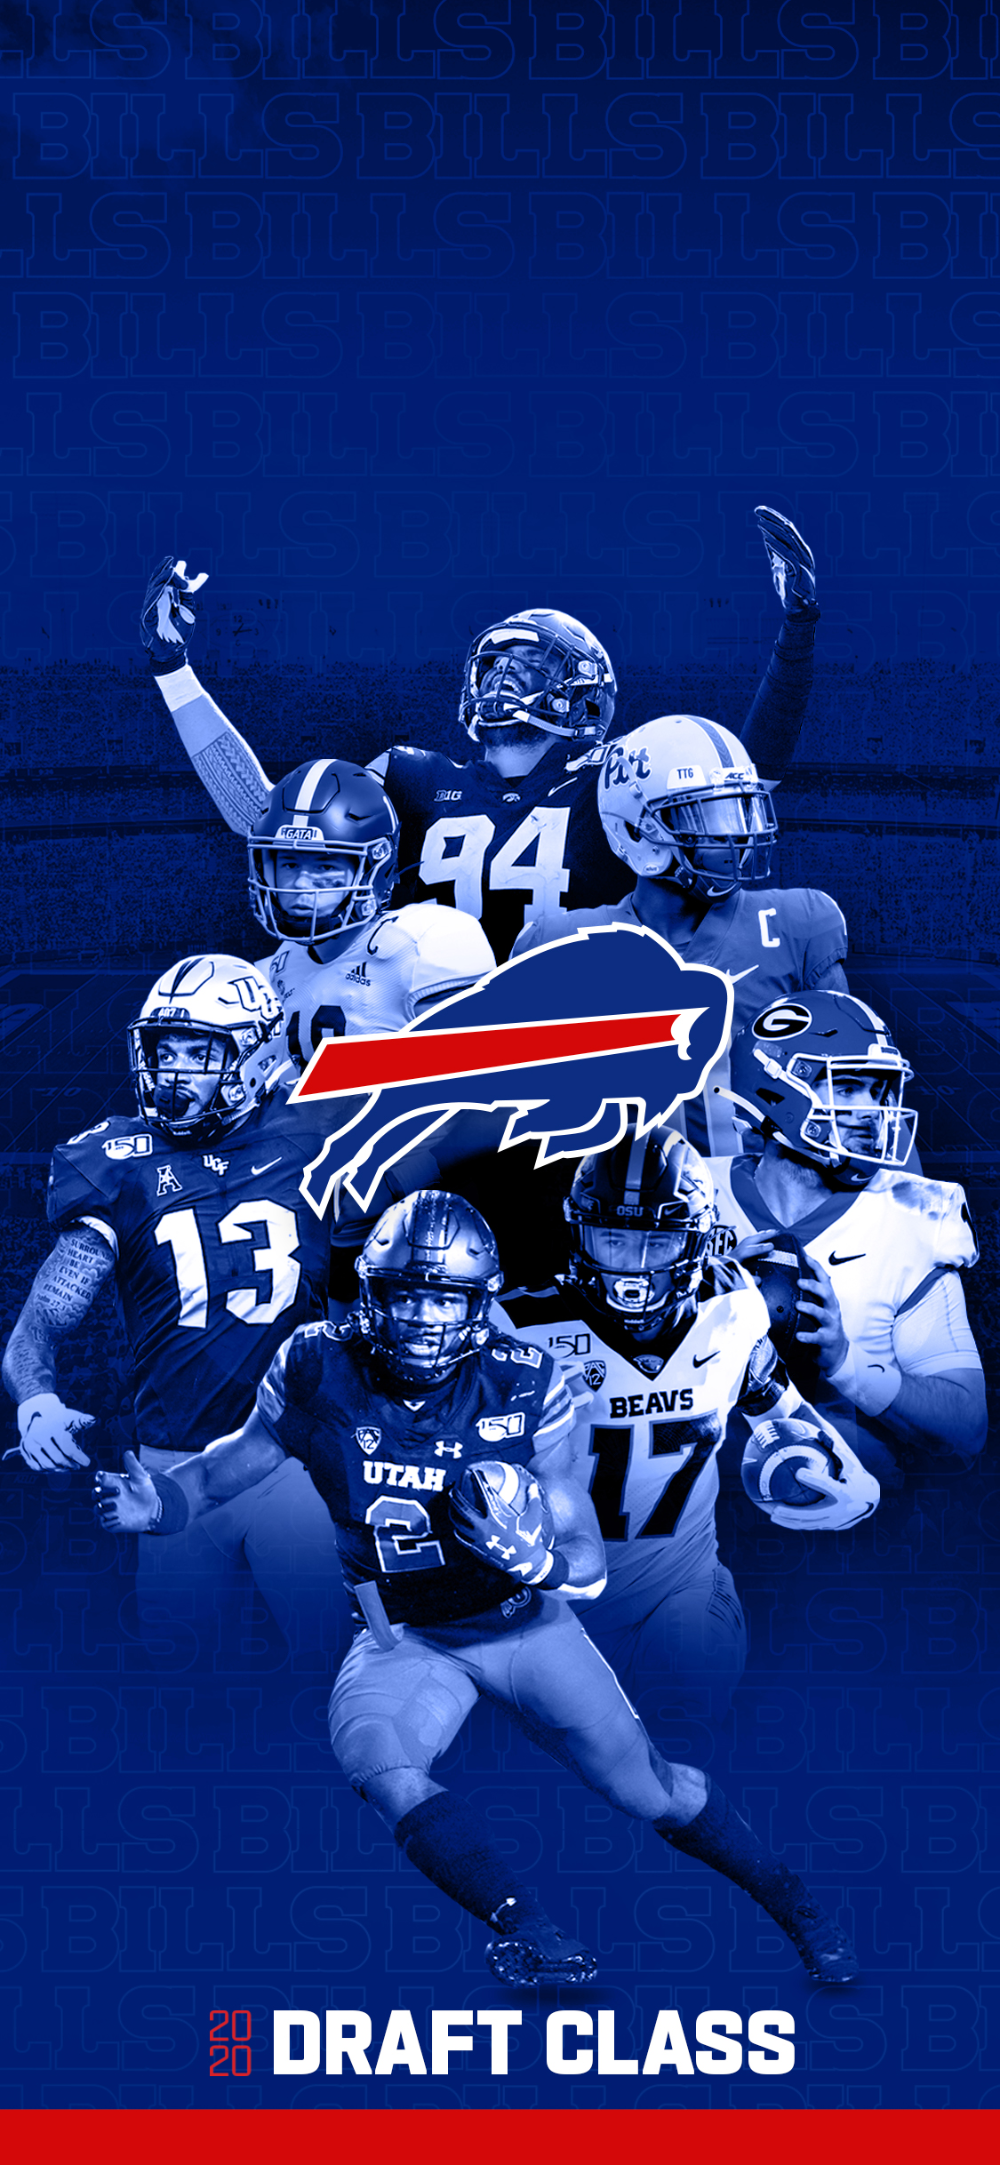 Buffalo Bills On Twitter Buffalo Bills Football Buffalo Bills Buffalo Bills Stuff